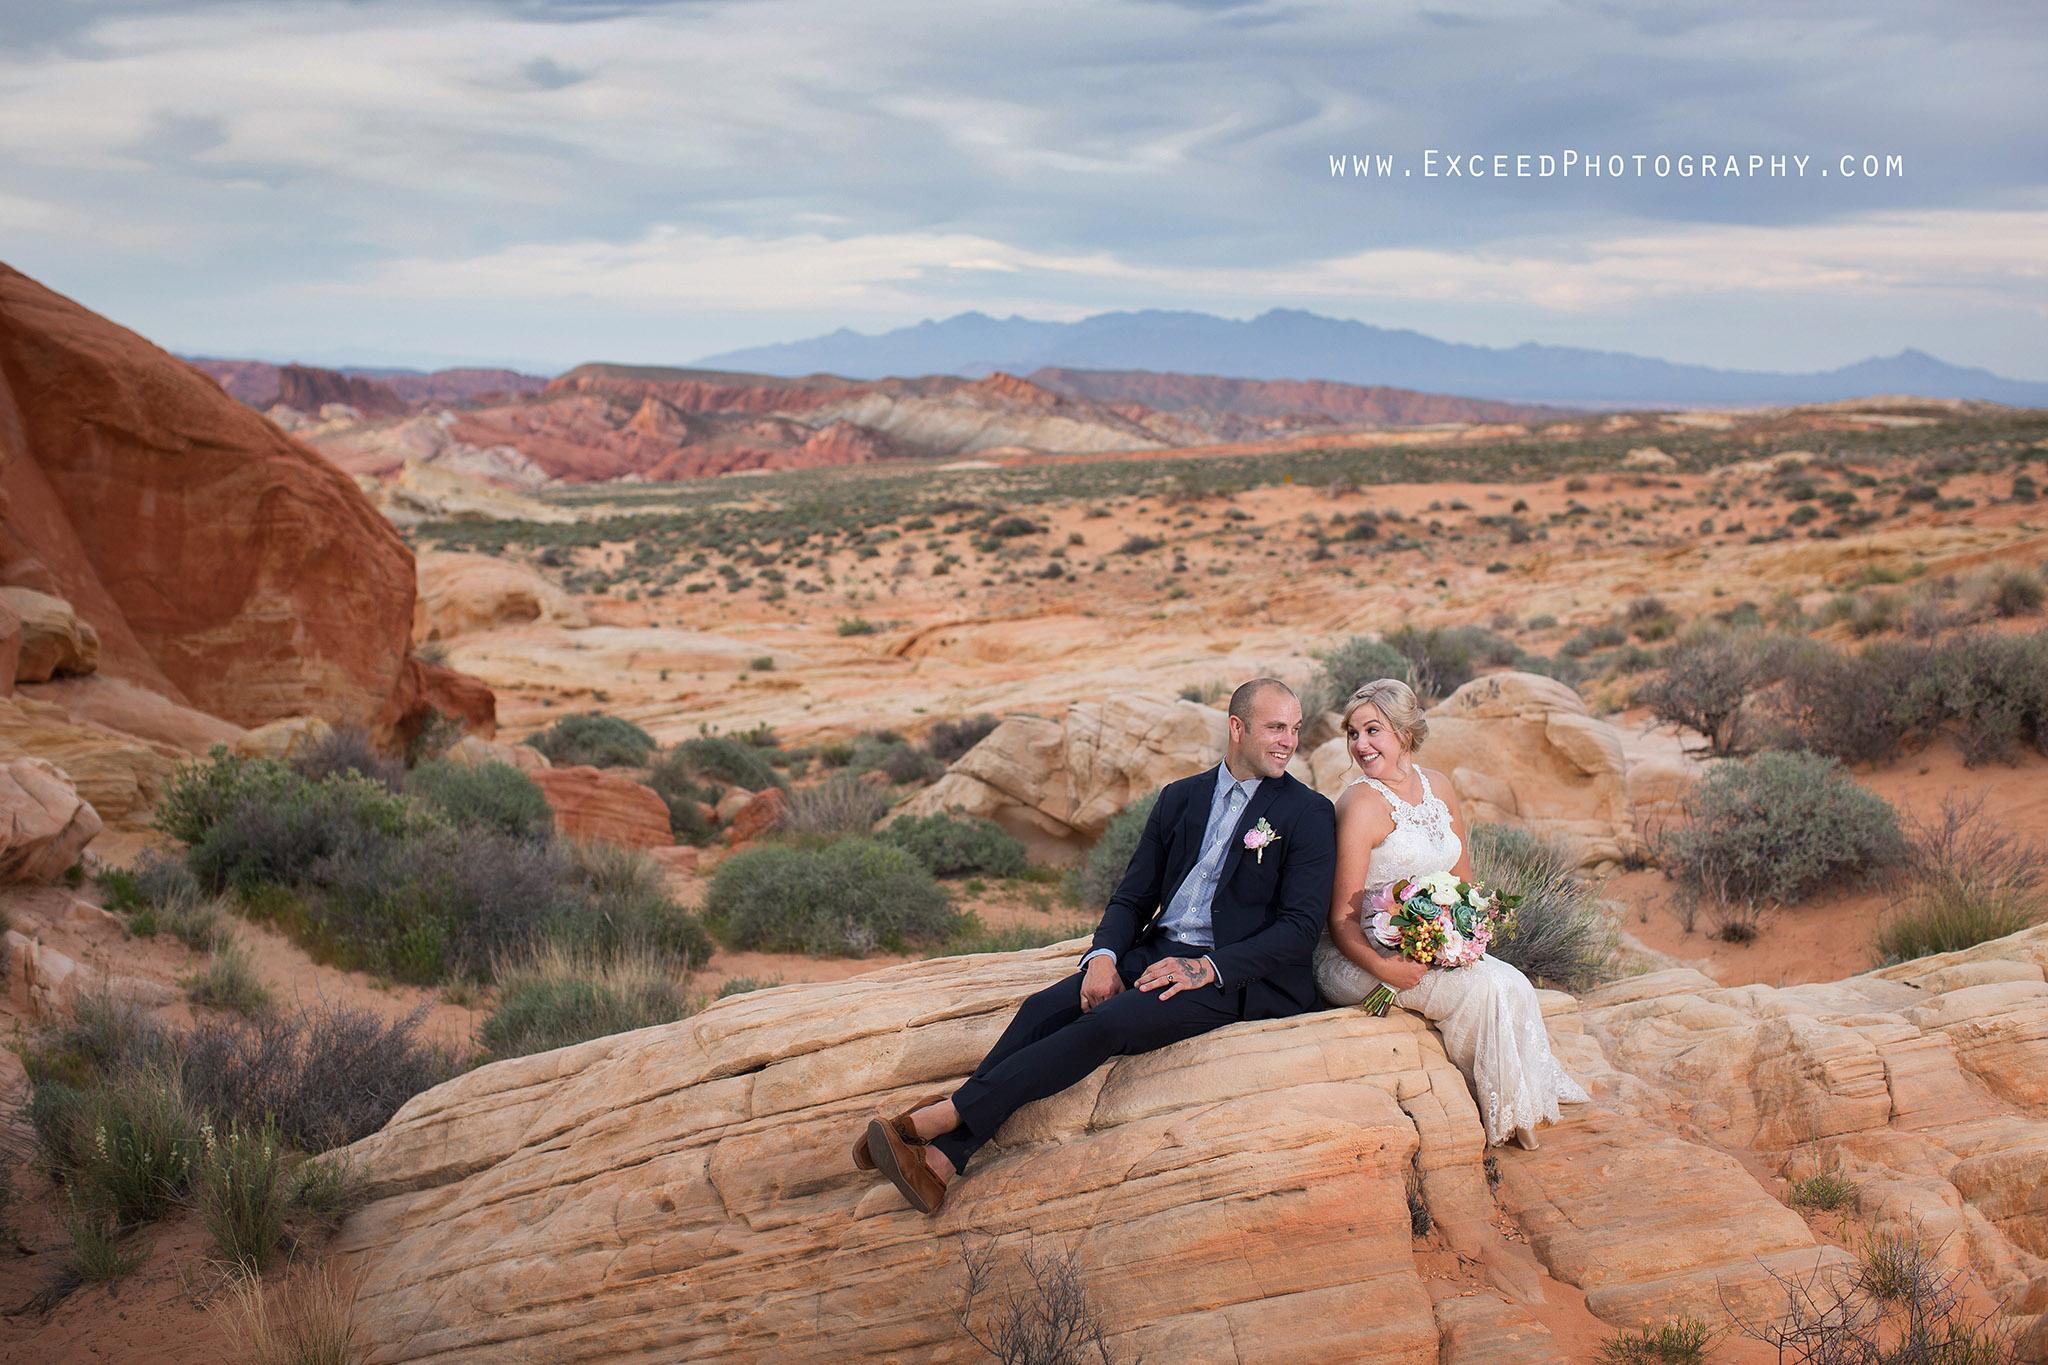 Las Vegas Desert Photography Tours